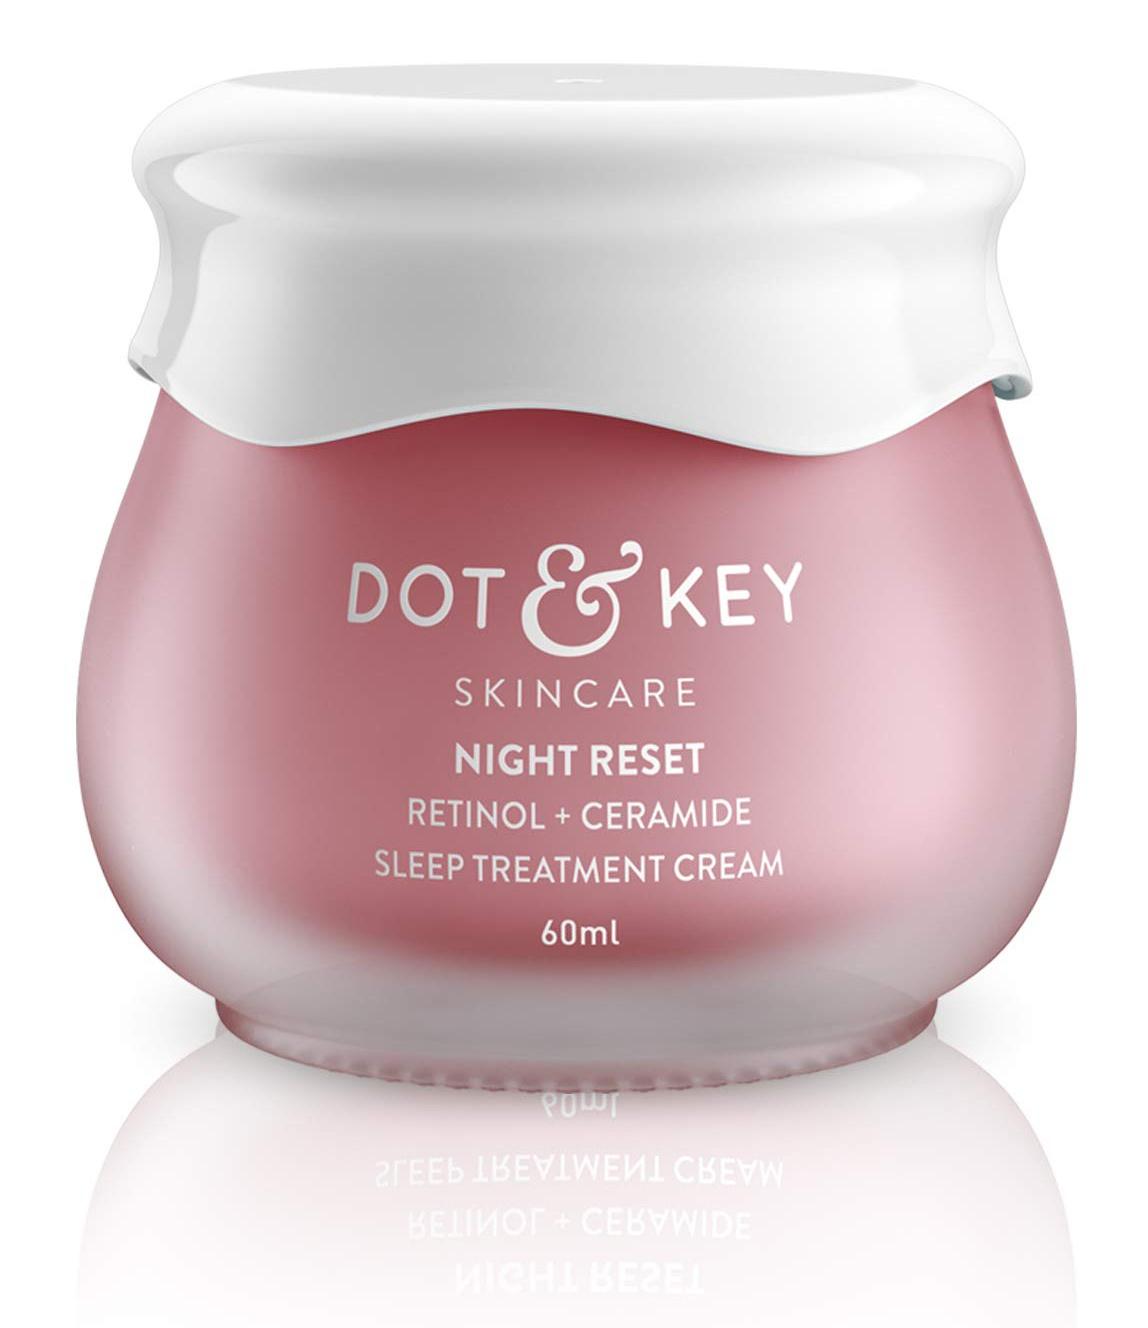 Dot & Key Night Reset Retinol + Ceramide  Sleep Treatment Cream